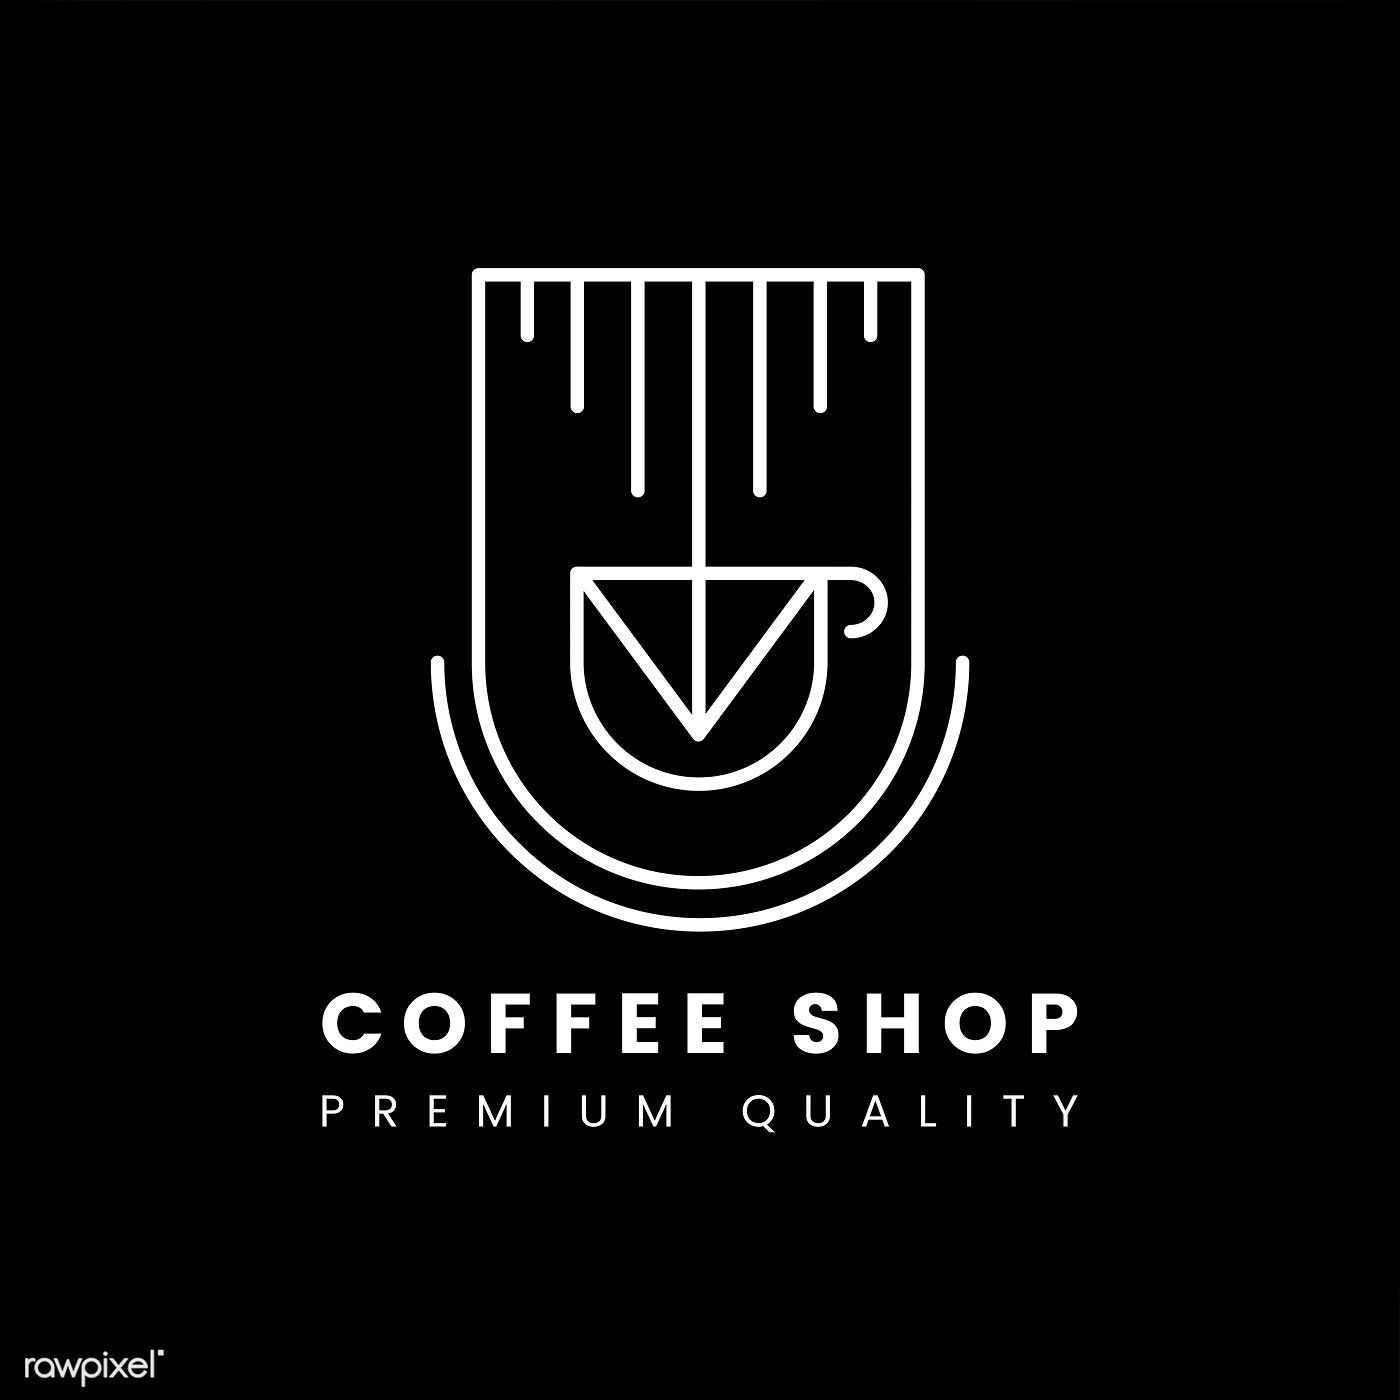 Premium Quality Coffee Shop Logo Vector Free Image By Rawpixel Com Aew Coffee Shop Logo Shop Logo Tea Logo